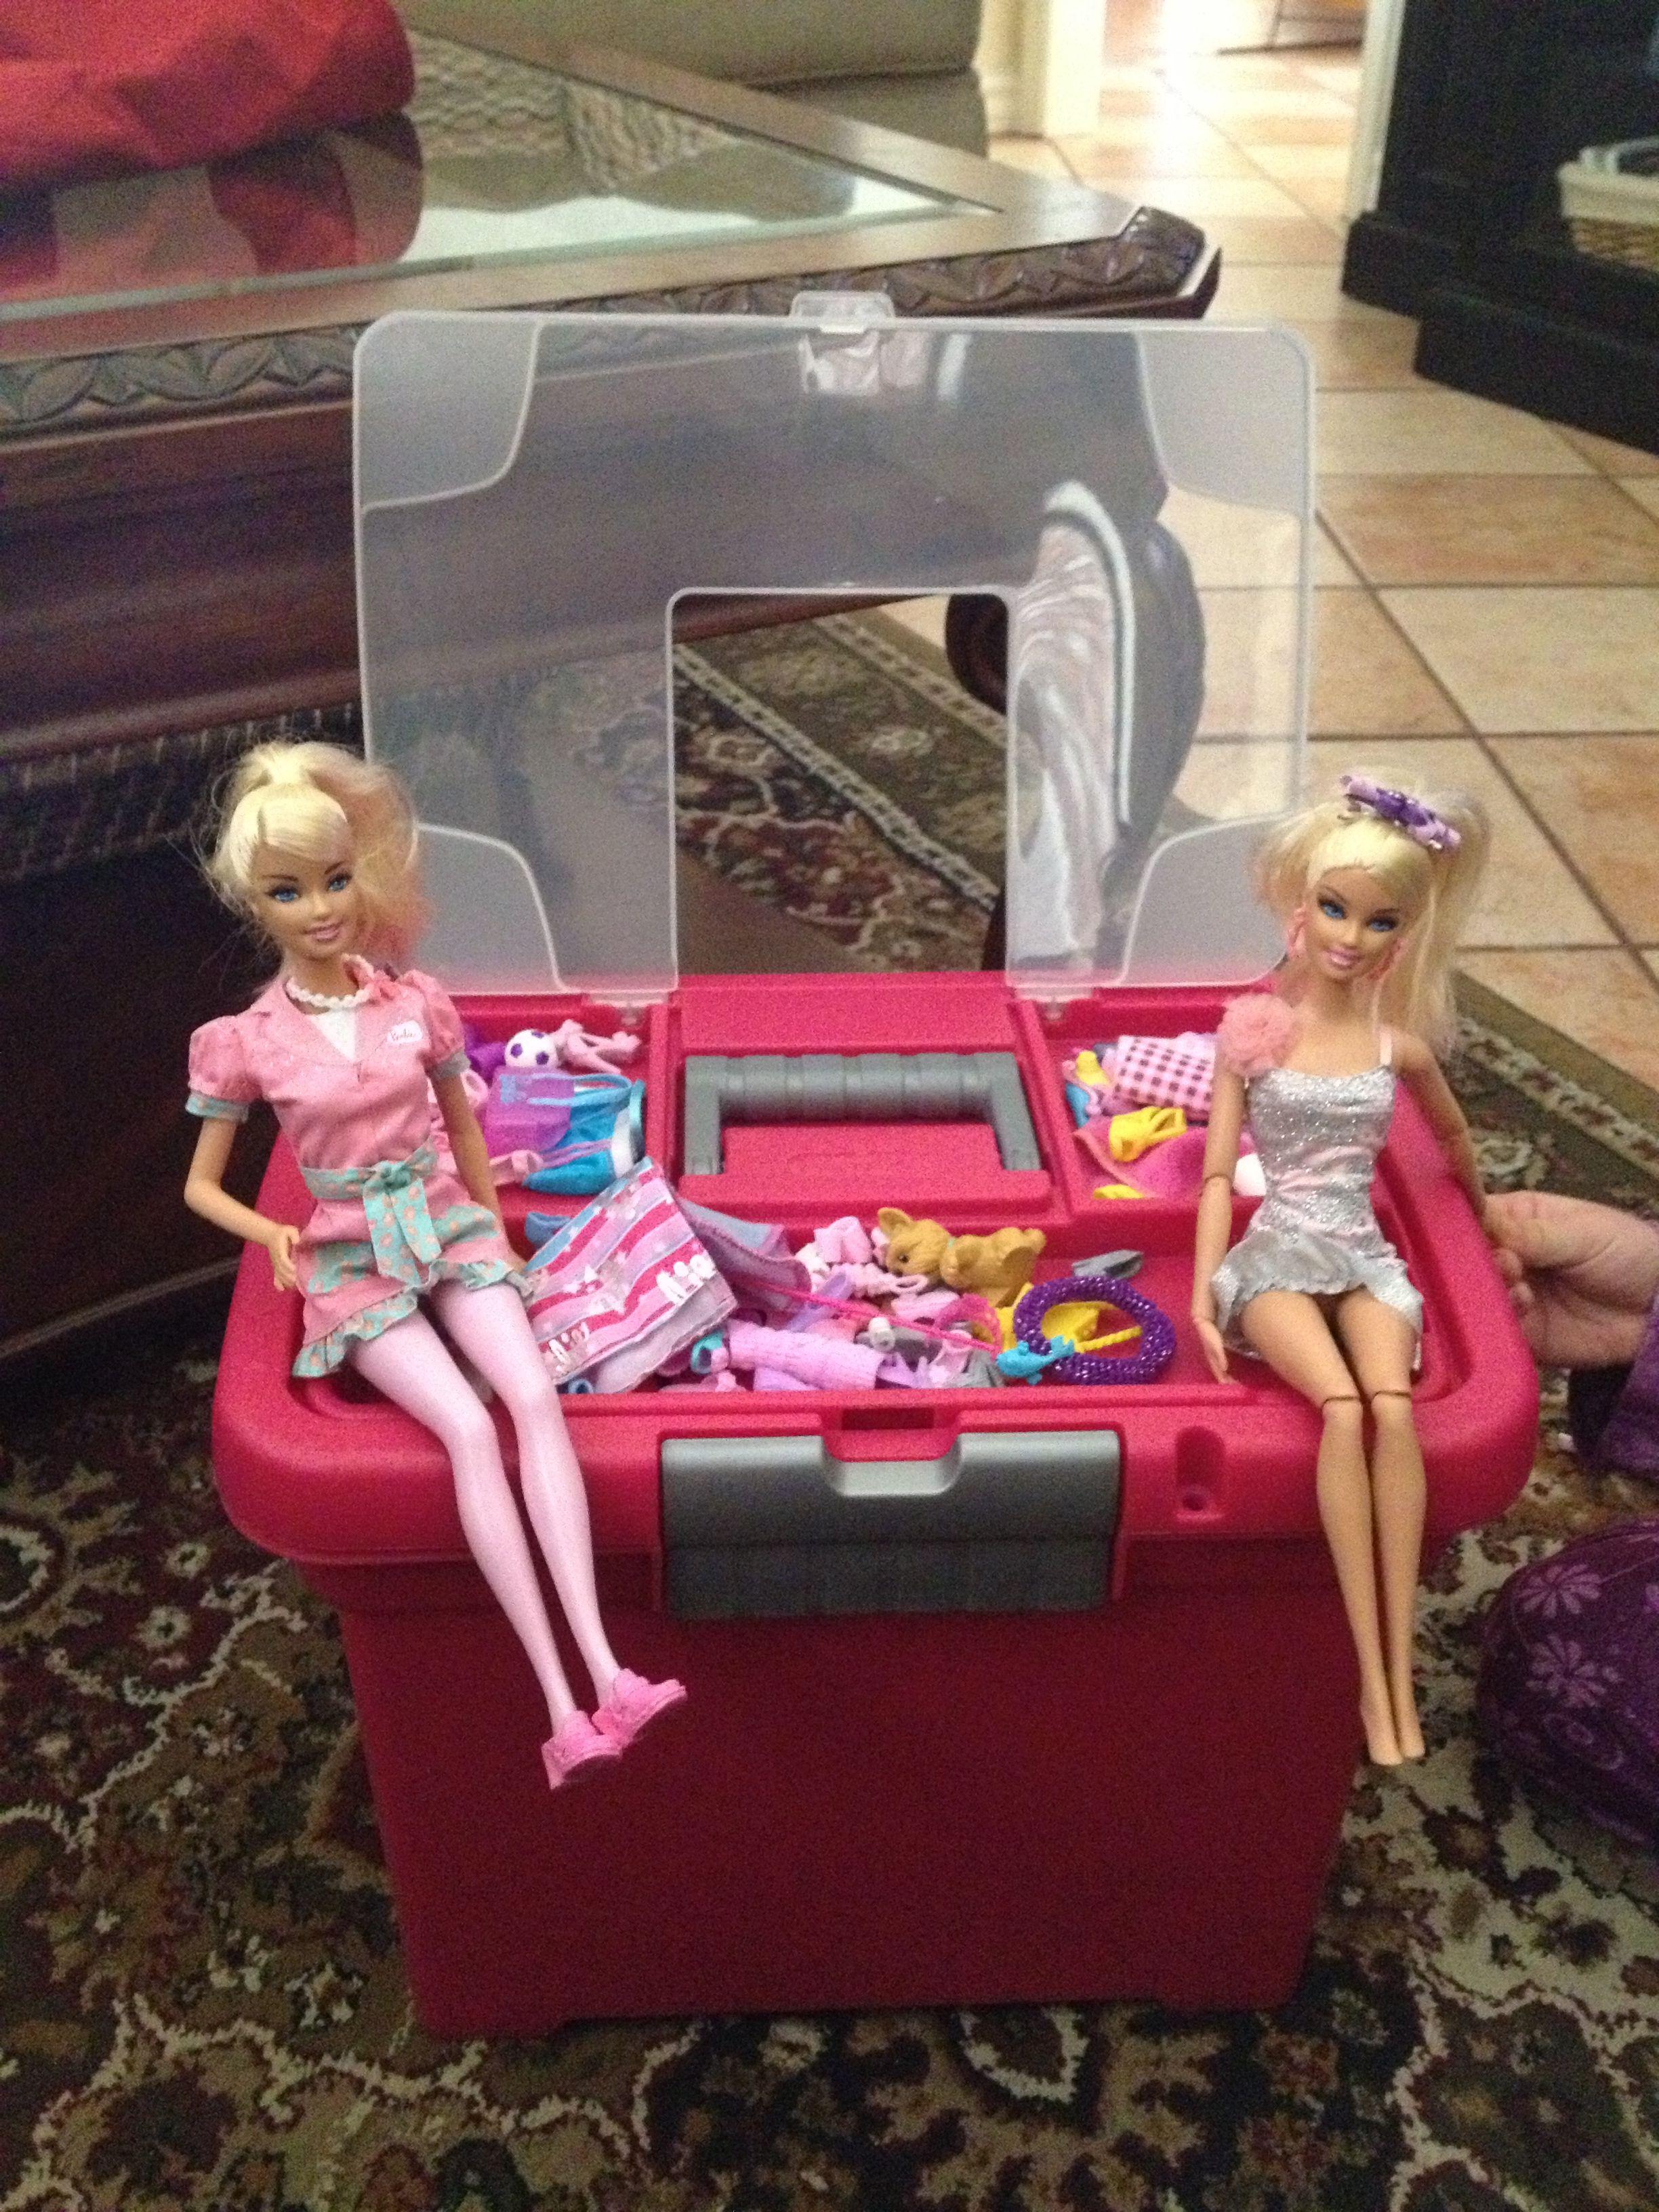 Sterlite File Box To Hold Barbie Accessories On Top And Barbies Inside Barbie Accessories File Box Barbie